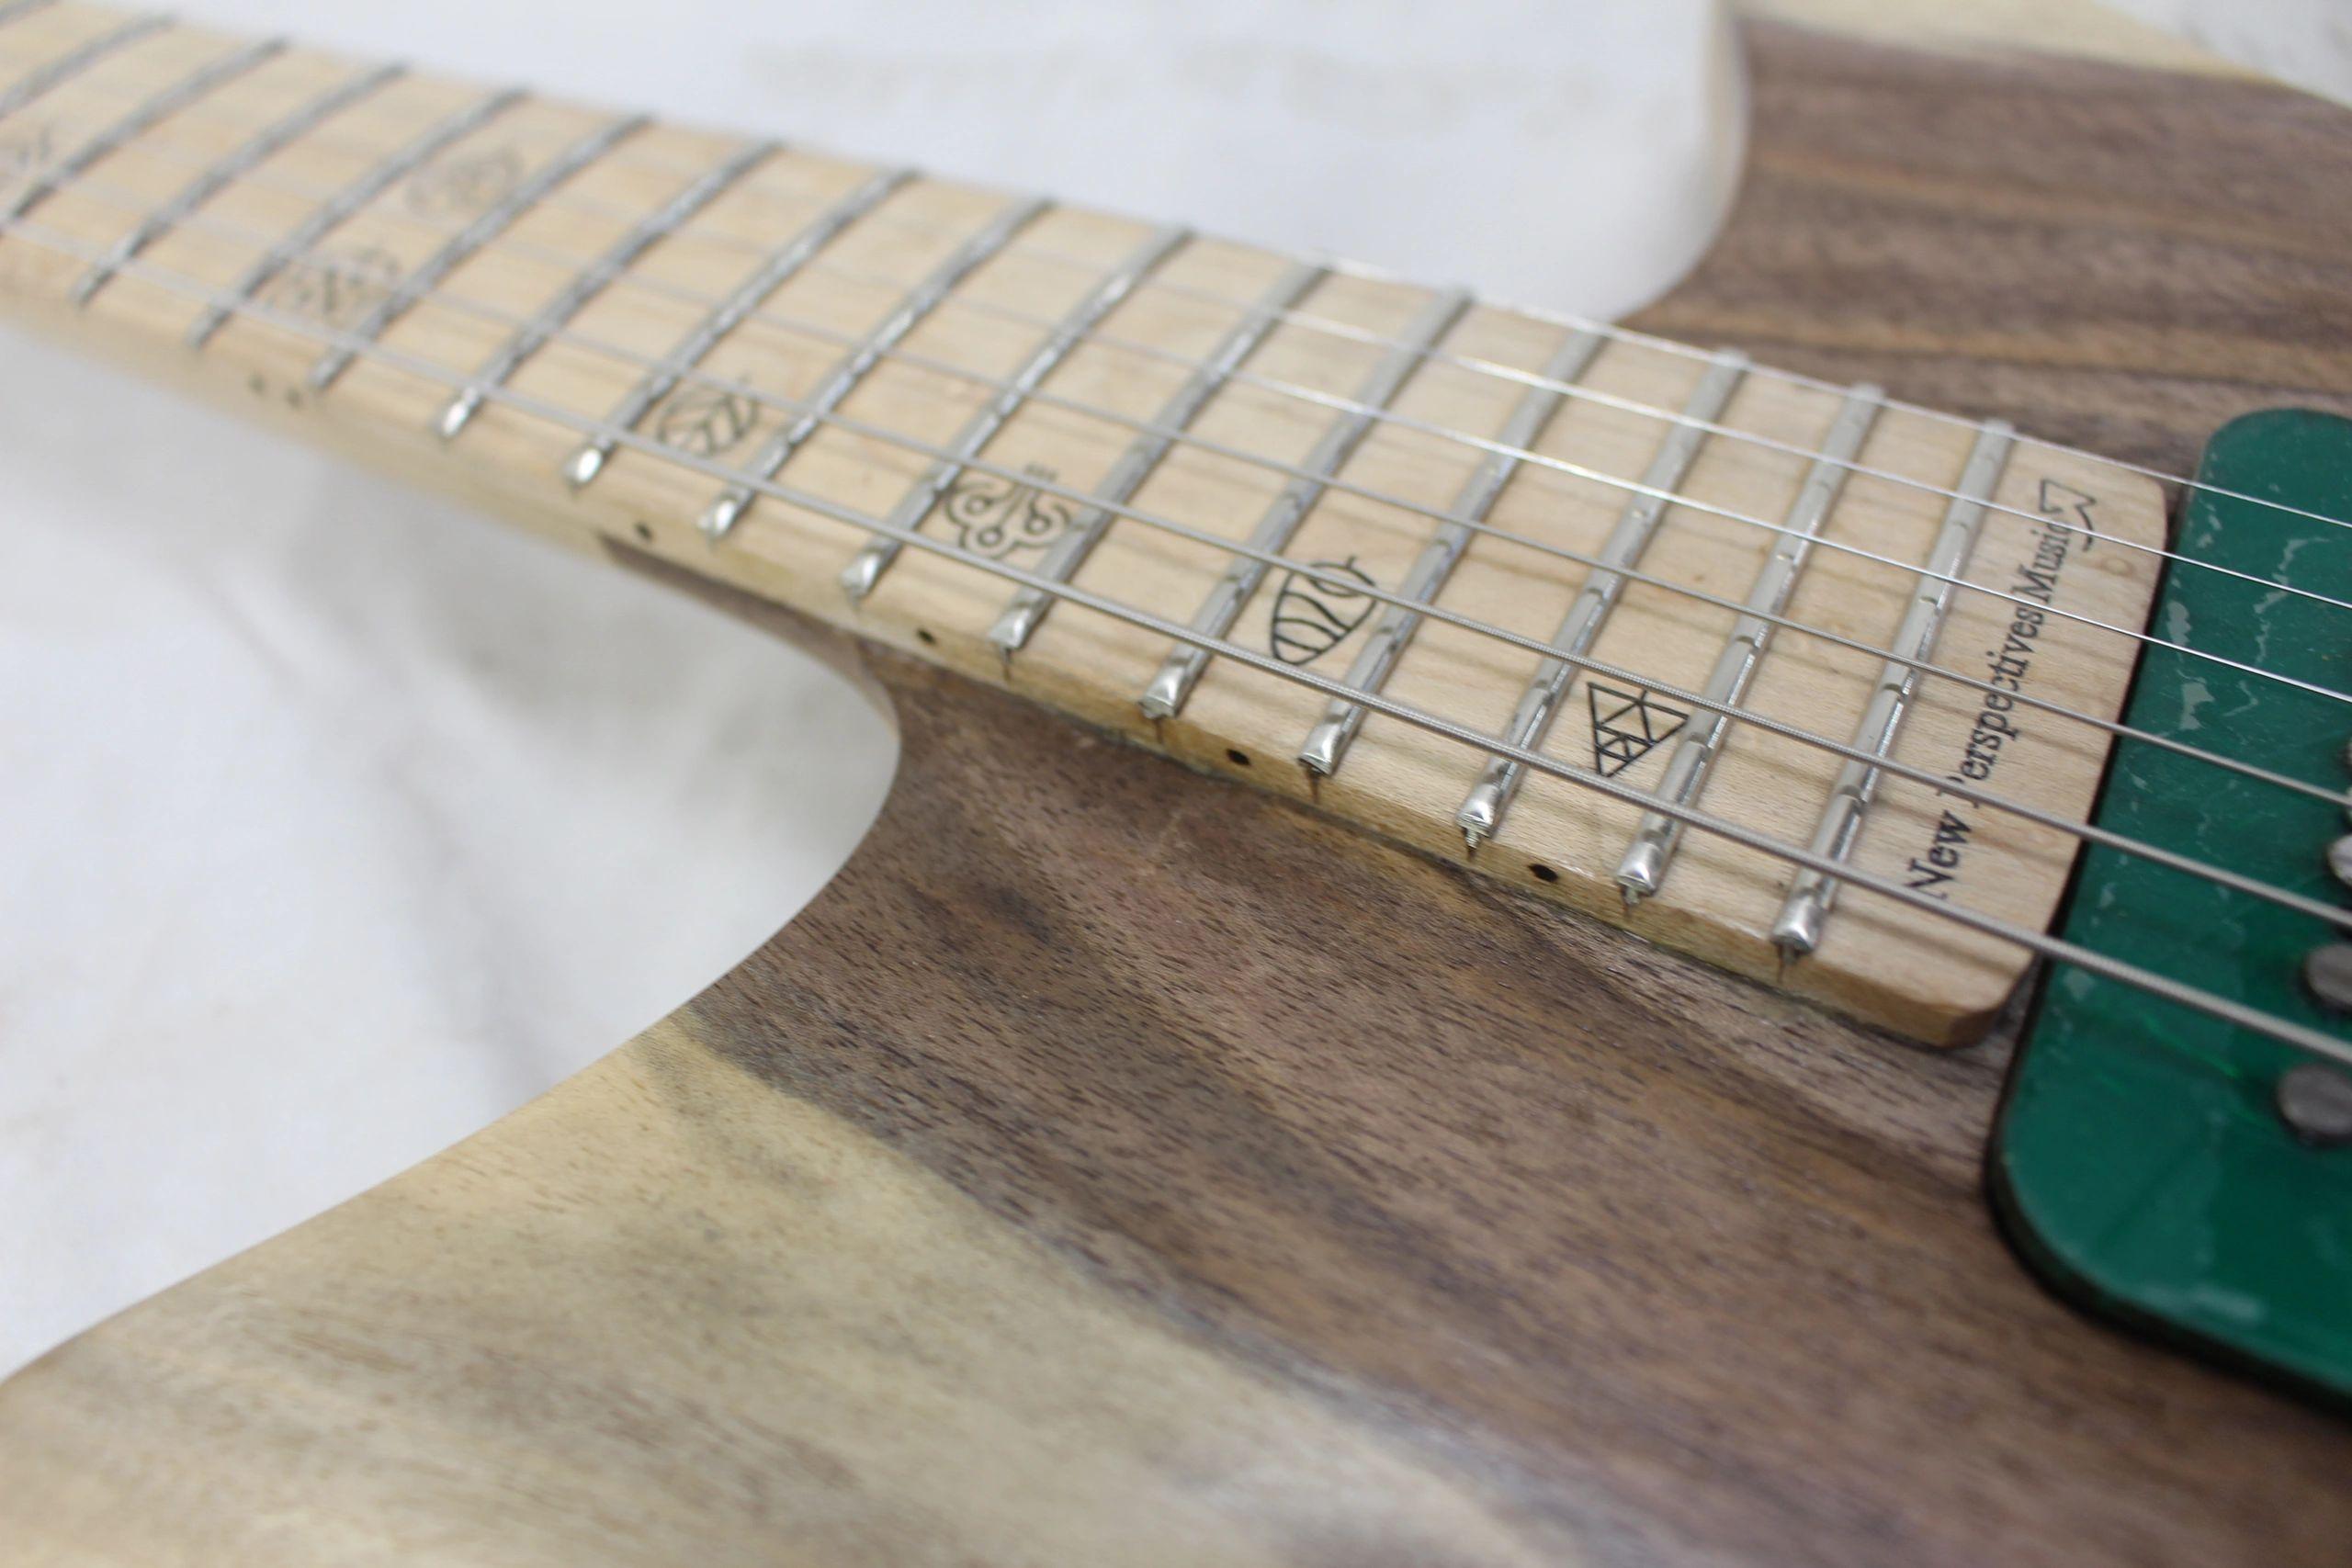 New Perspectives Music Guitar Reclaimed Bass Guitar